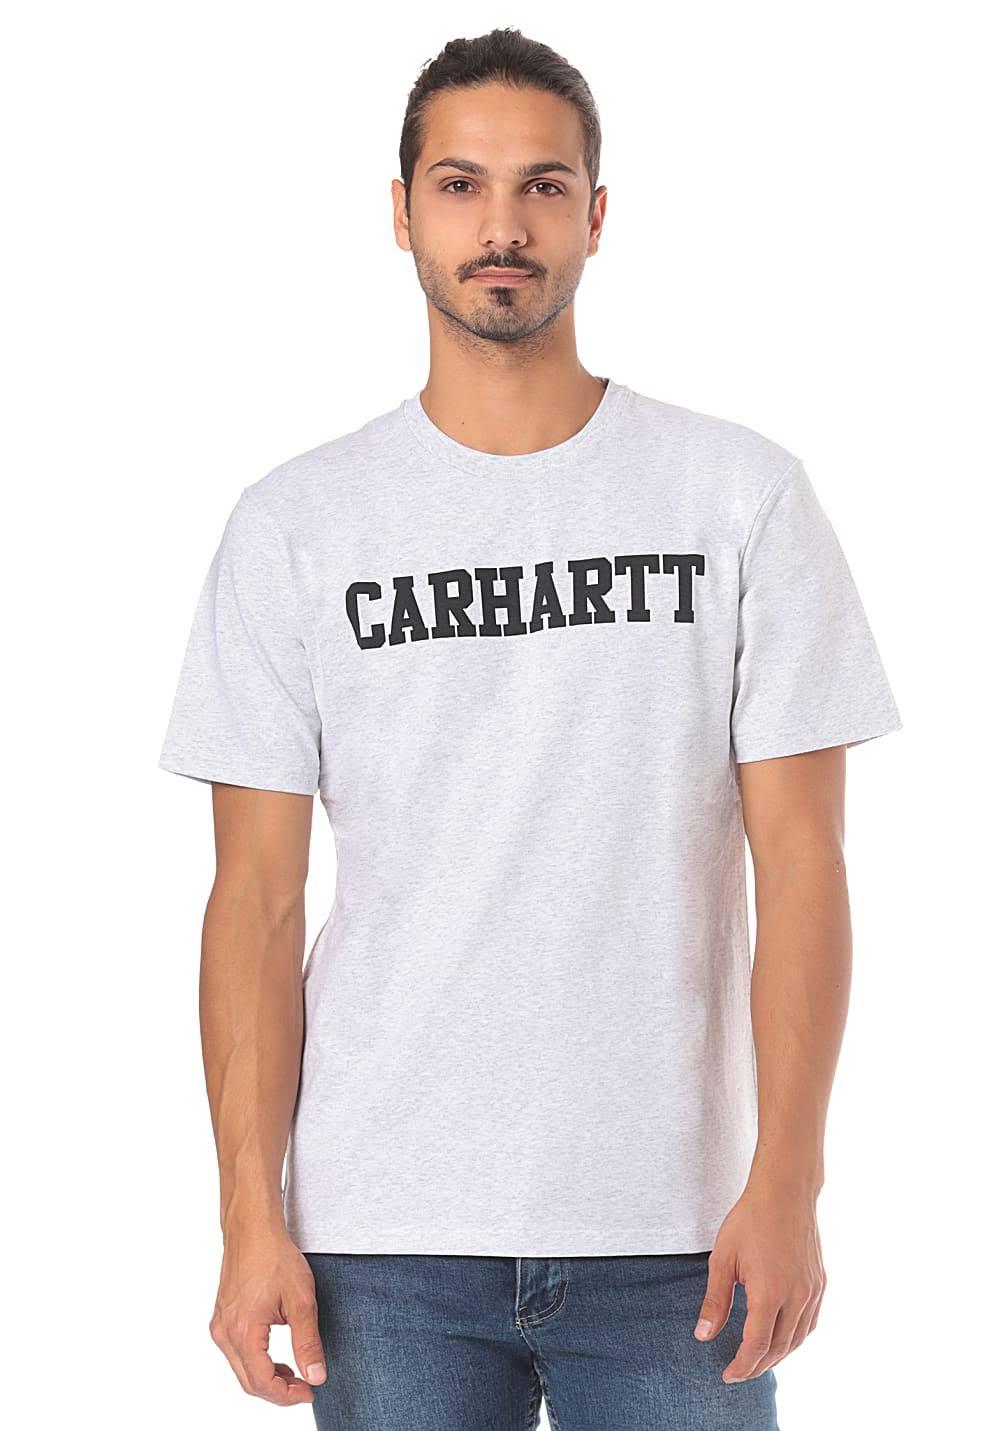 Men's Ashheather Wip Carhartt darknavy College S tsdhQxrCB